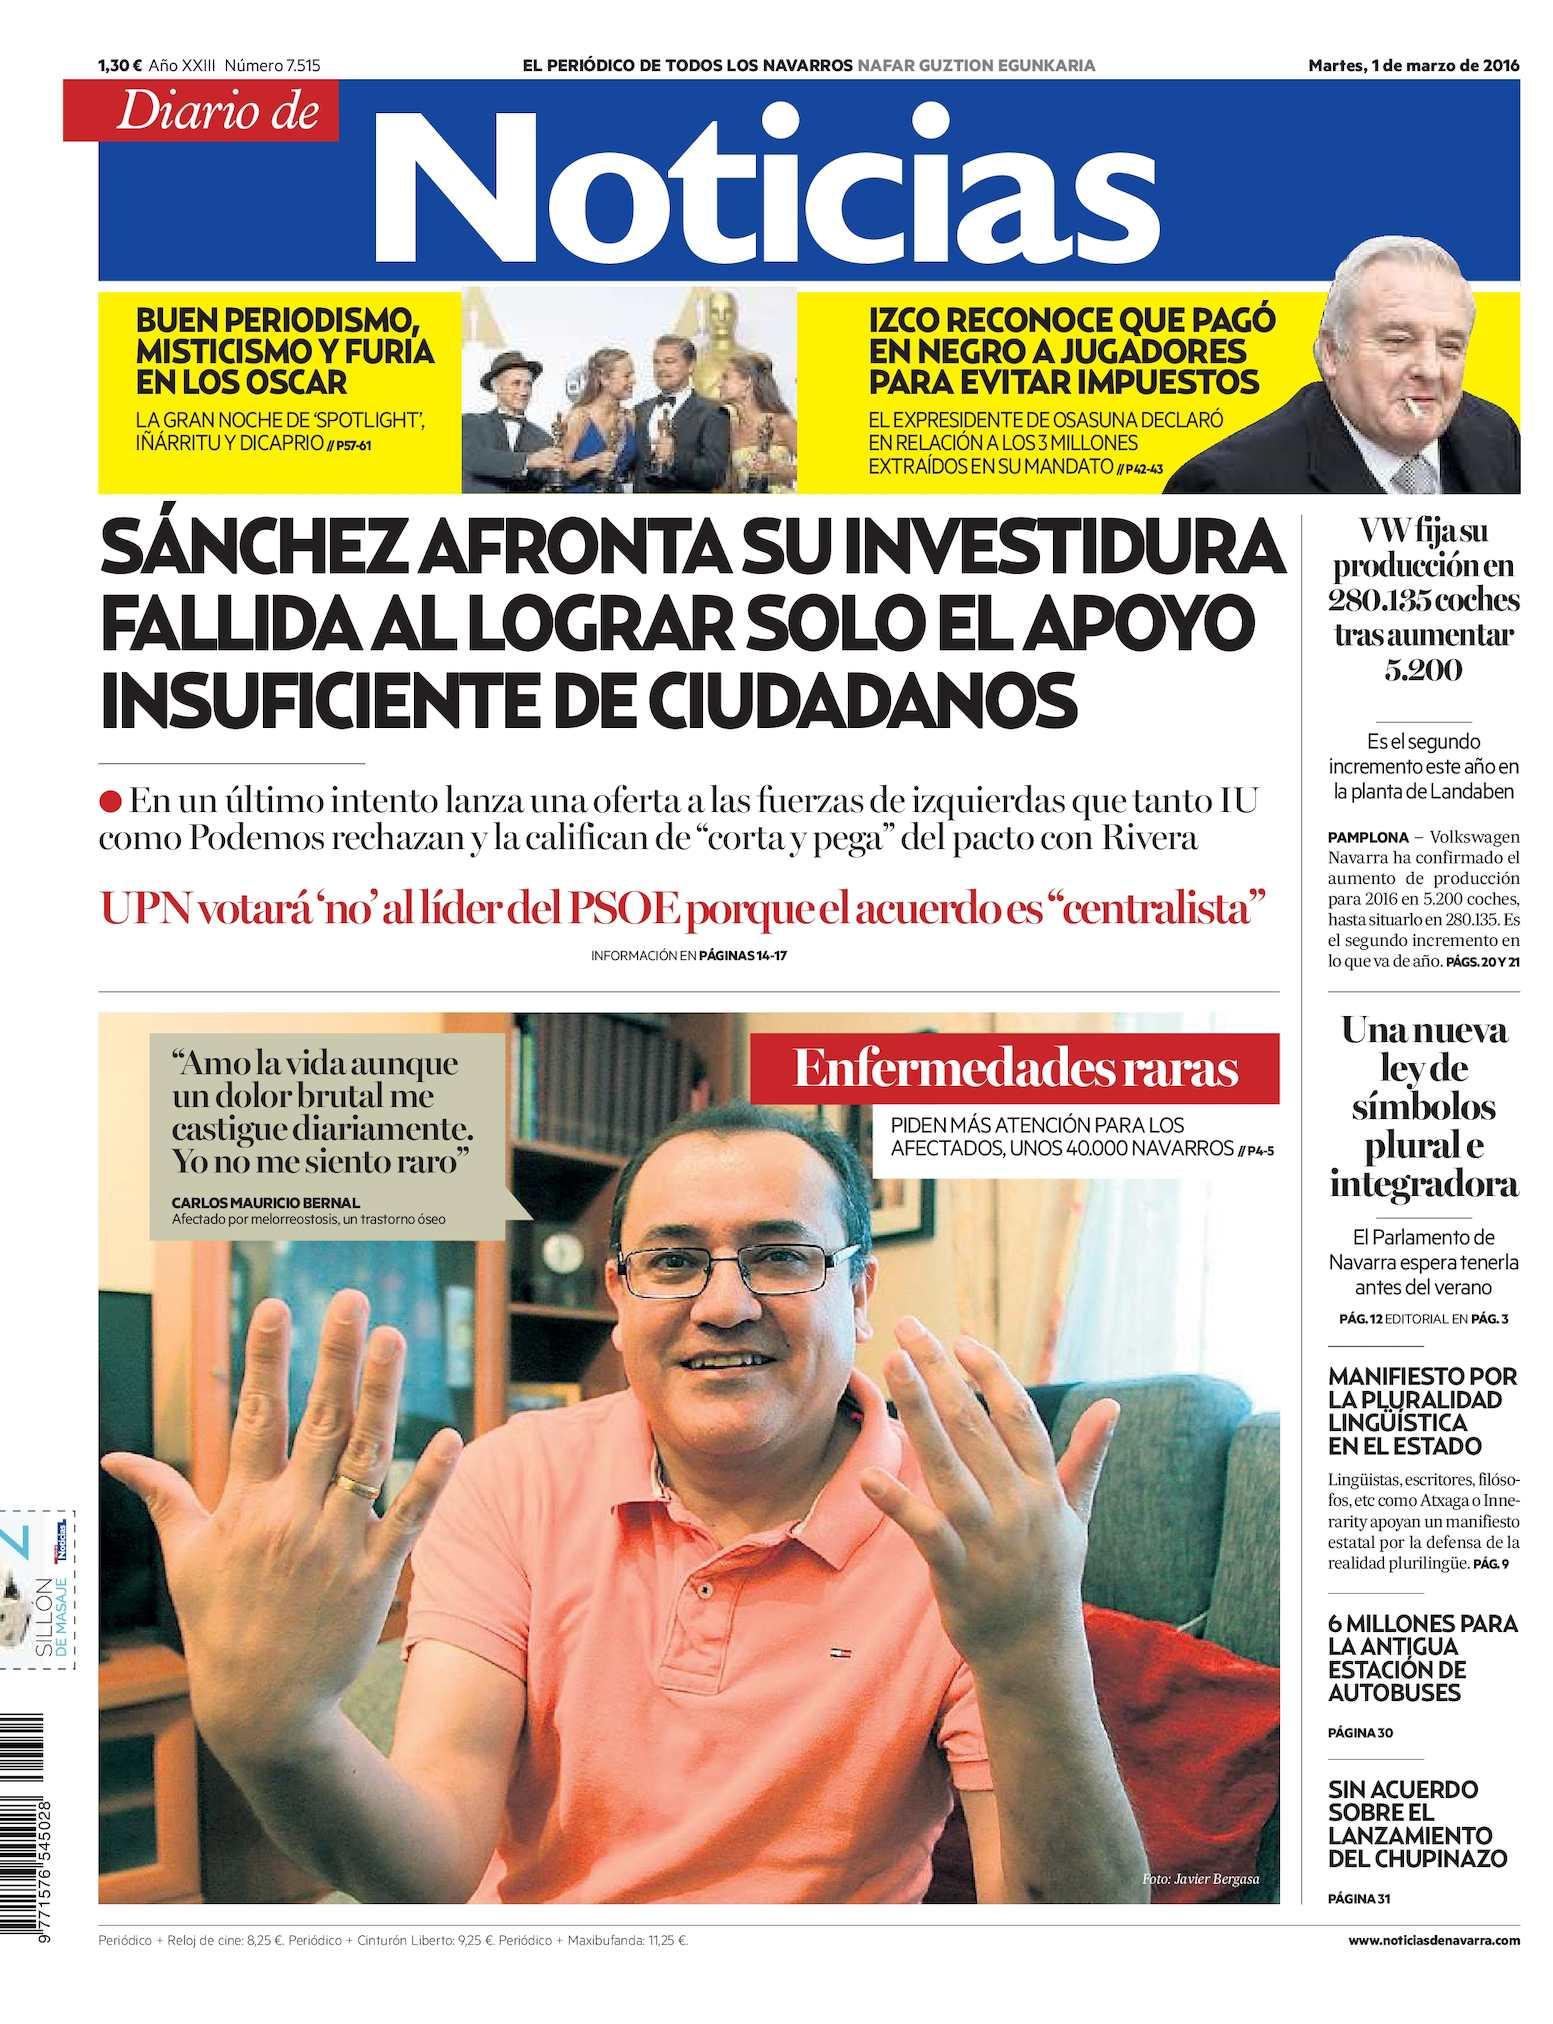 Calaméo - Diario de Noticias 20160301 b643af4b2dc9c